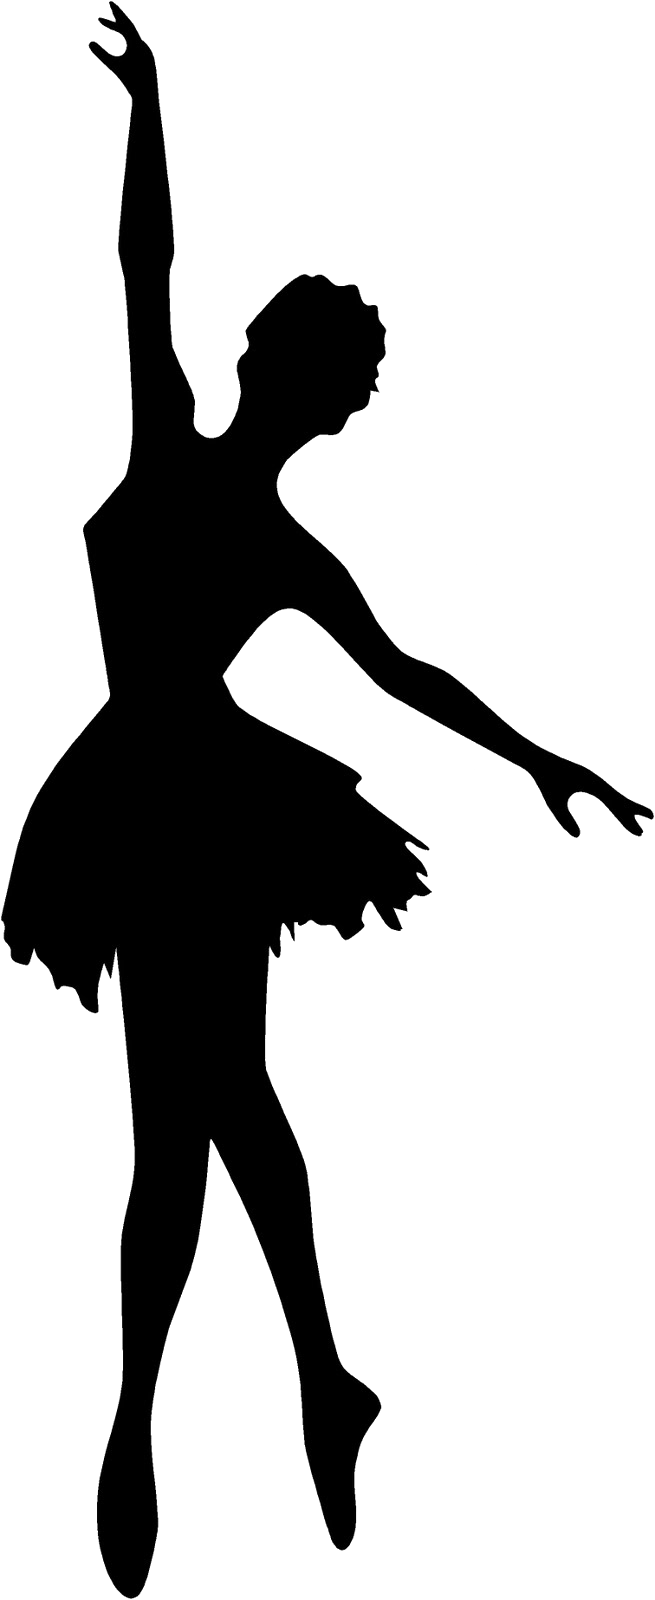 Картинка балерина силуэт черный